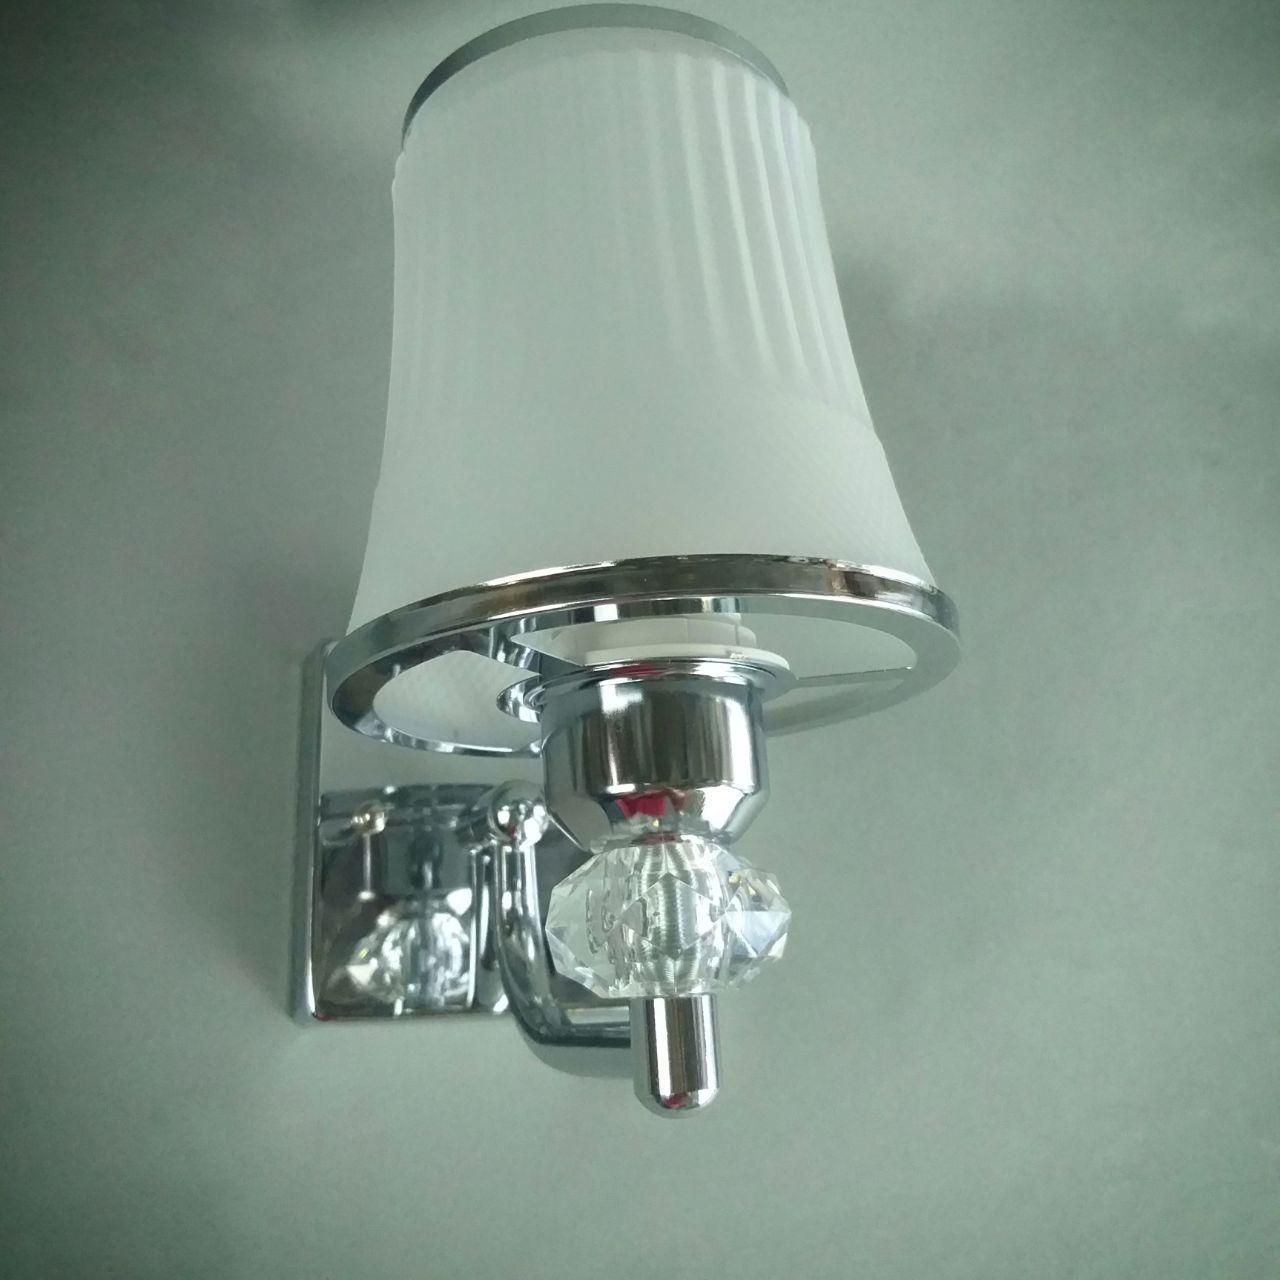 Бра на одну лампу в хроме HQ-8214/1W (12шт)